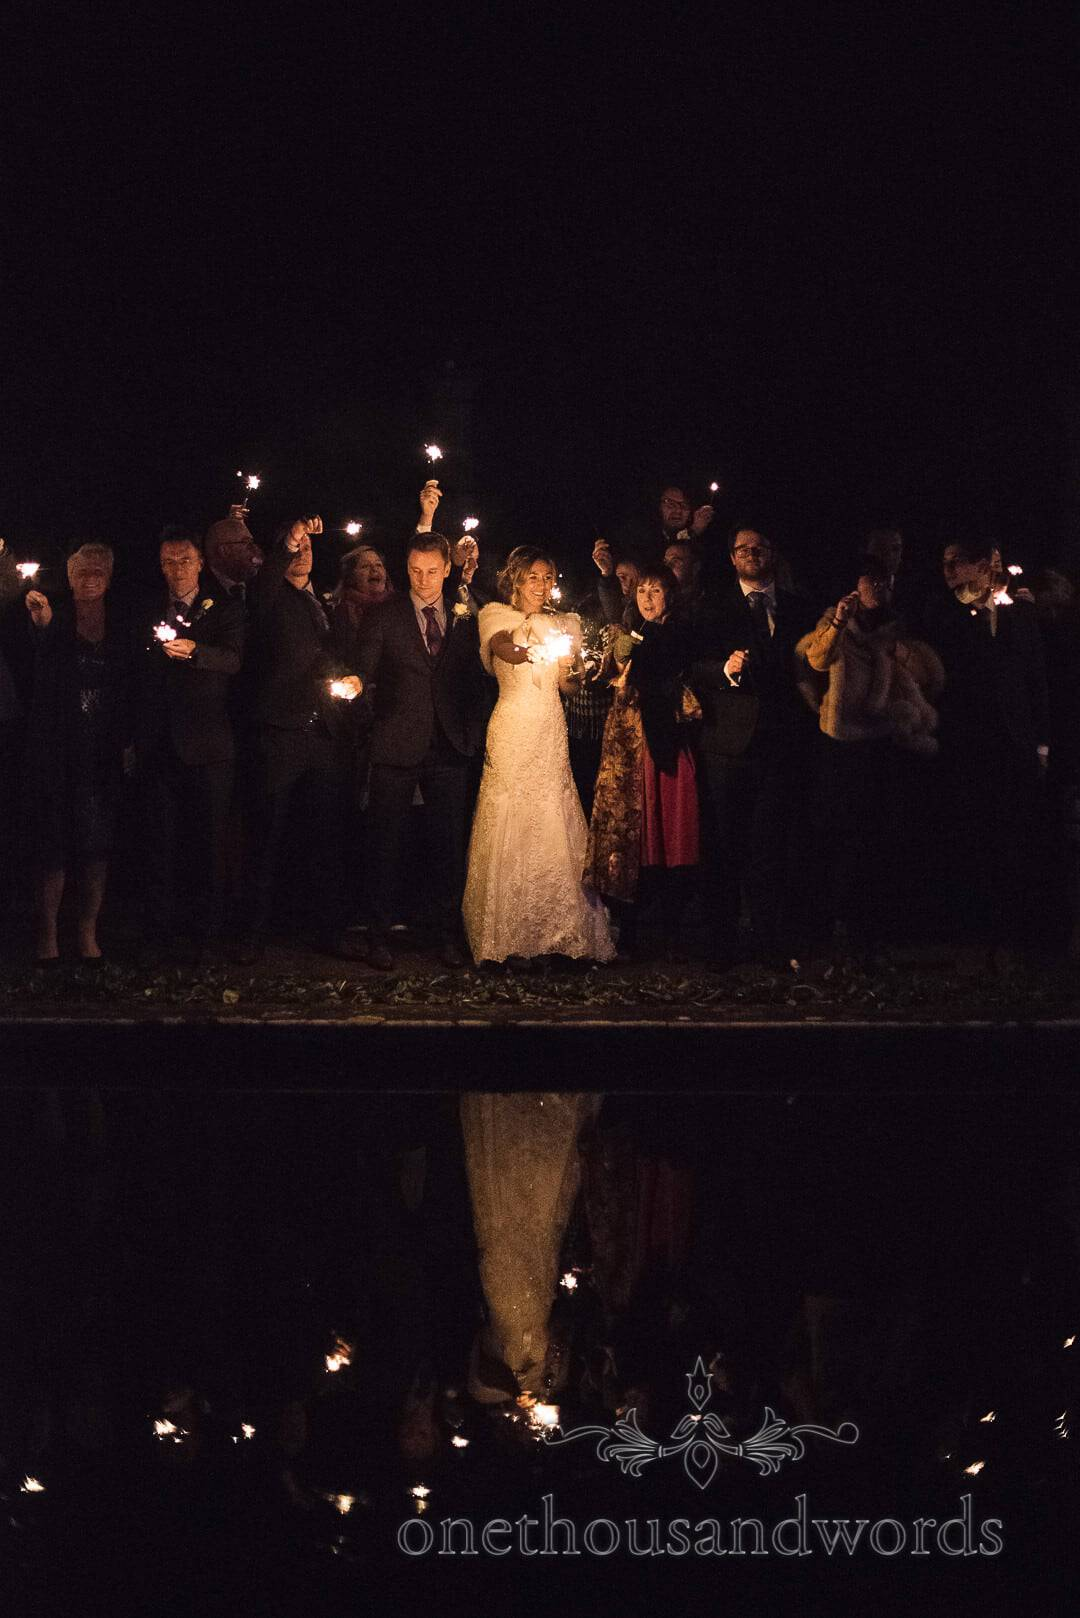 Wedding Sparklers reflection at The Italian Villa Wedding Venue Photographs